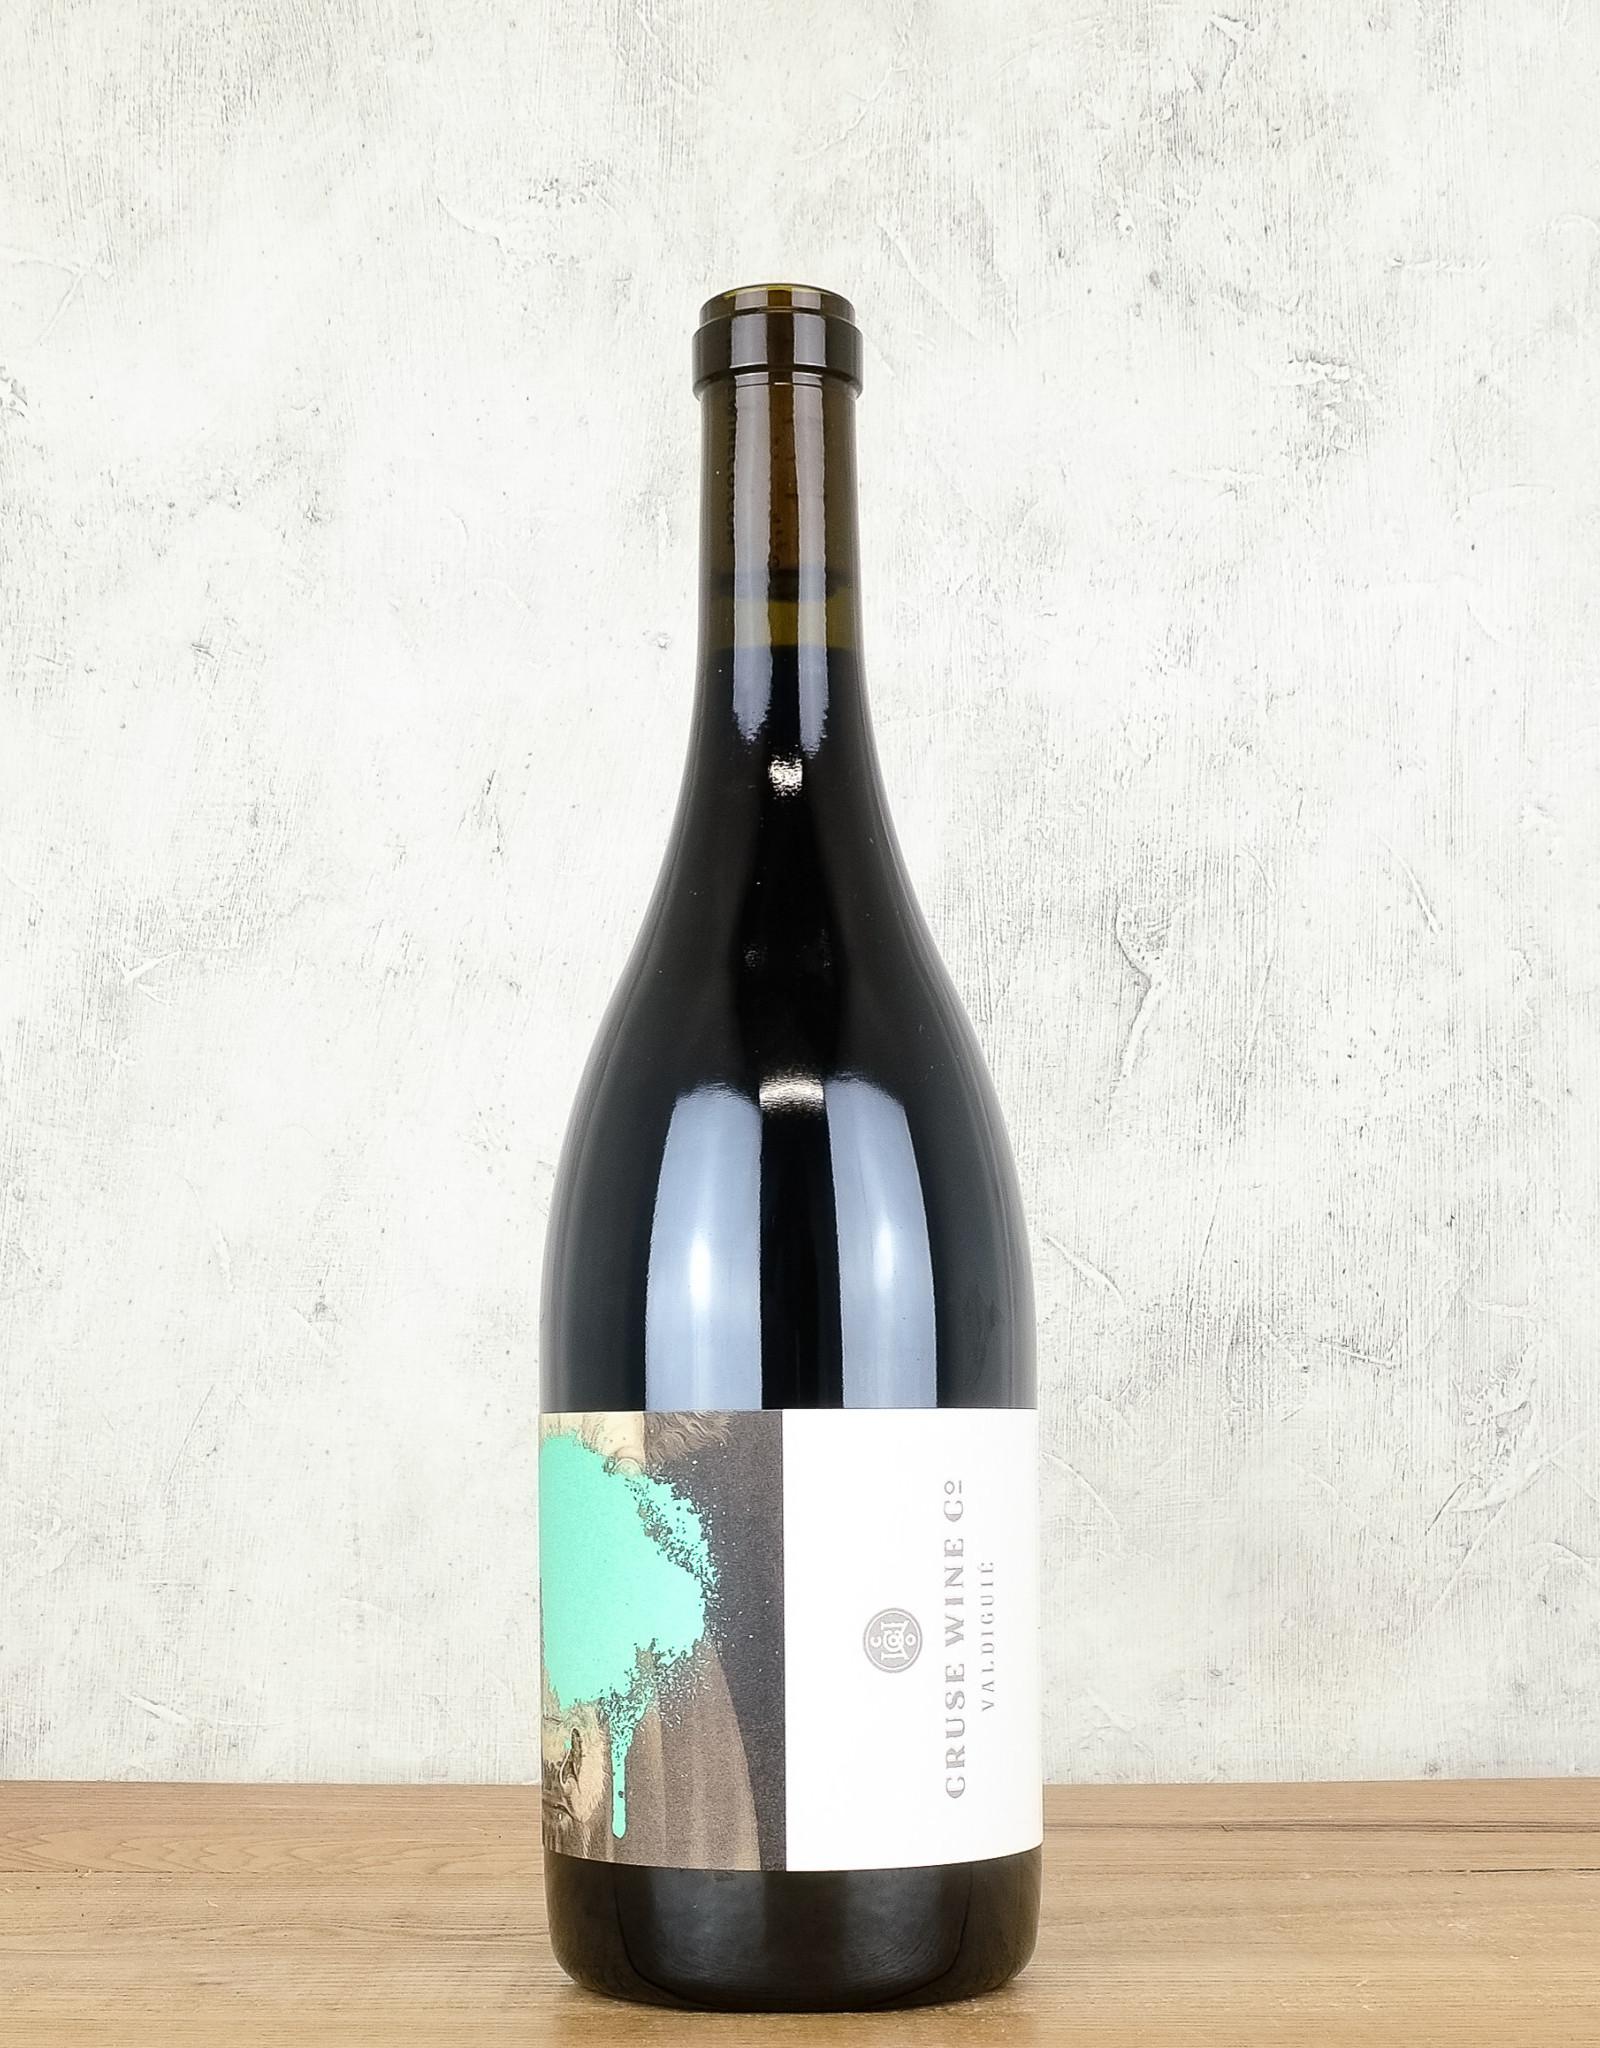 Cruse Wine Co. Valdiguie